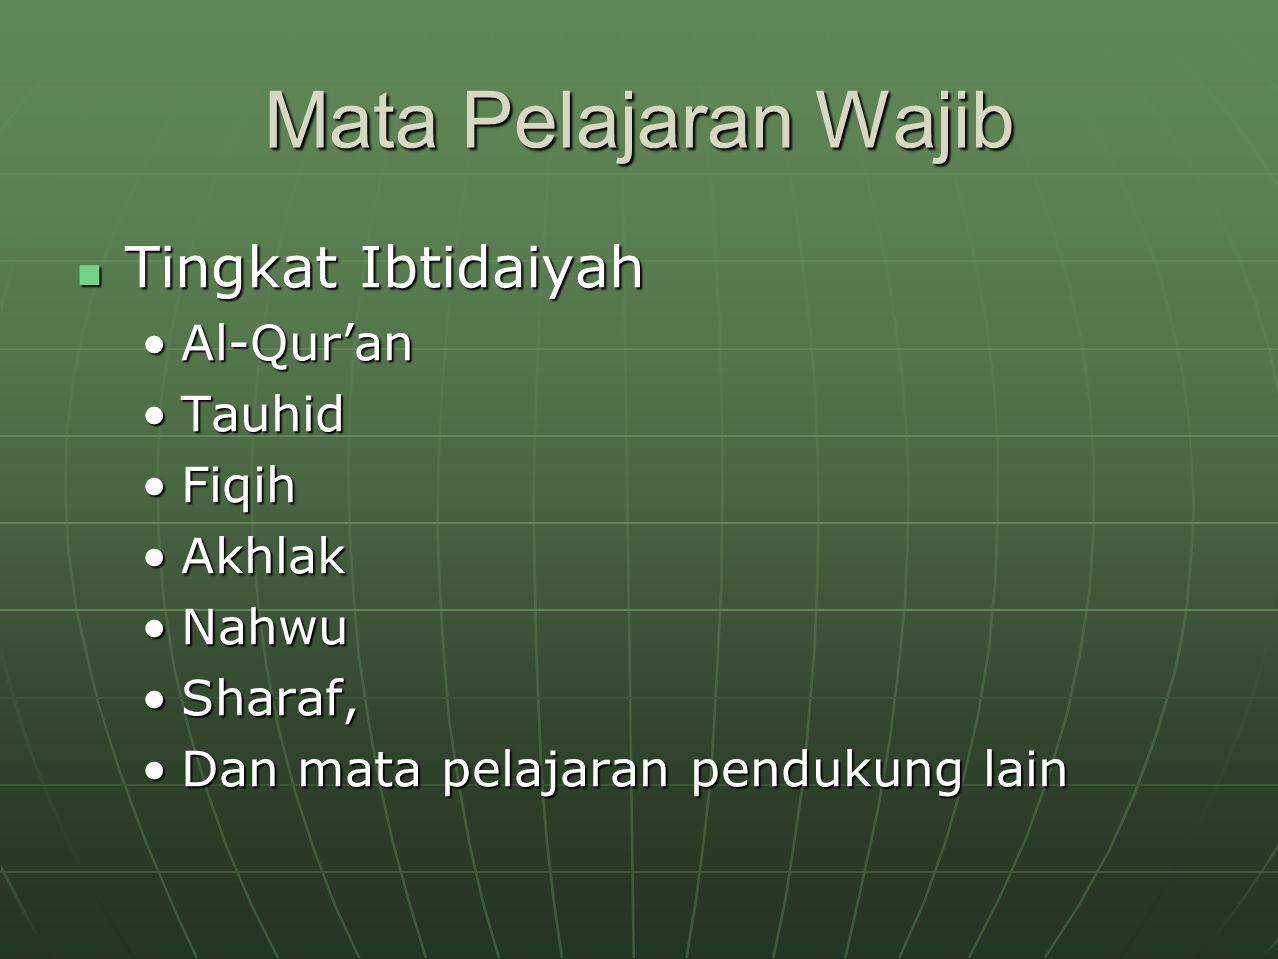 Tingkat Tsanawiyah Tingkat Tsanawiyah Al-Qur'anAl-Qur'an TauhidTauhid FiqihFiqih AkhlakAkhlak NahwuNahwu SharafSharaf TarikhTarikh TajwidTajwid Dan pelajaran pendukung lainDan pelajaran pendukung lain